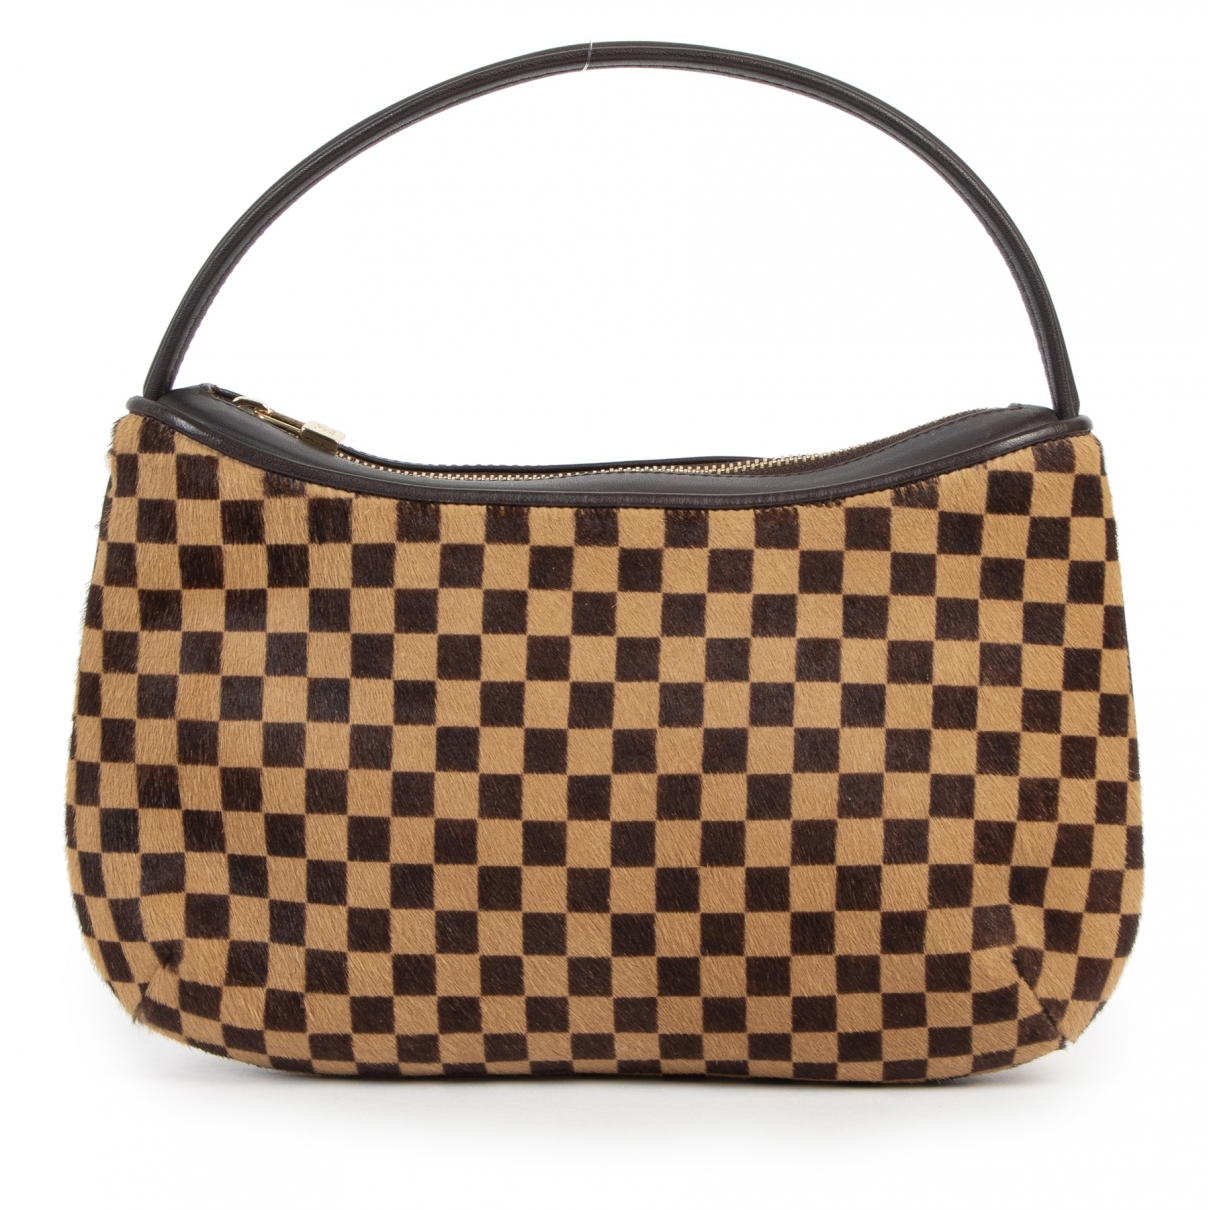 Bolso  Tigre de Piel de potro de imitacion Louis Vuitton